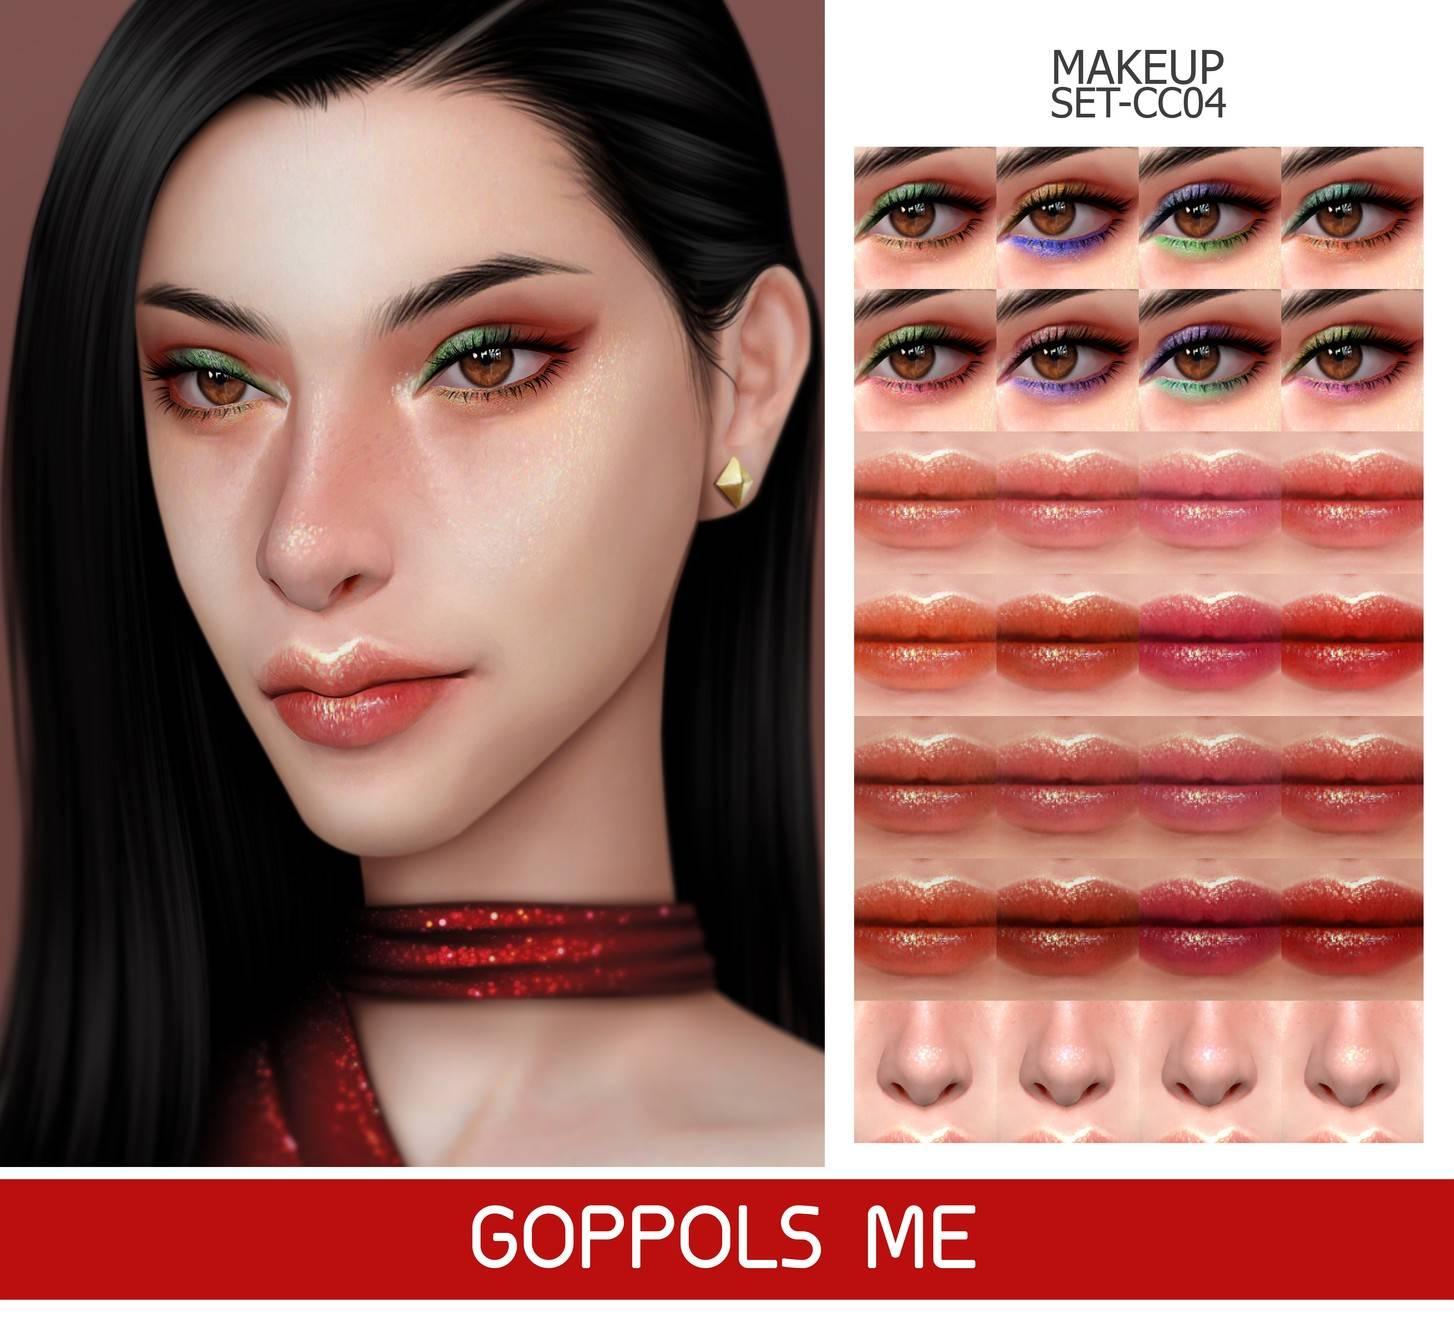 Набор косметики - MAKEUP SET CC04